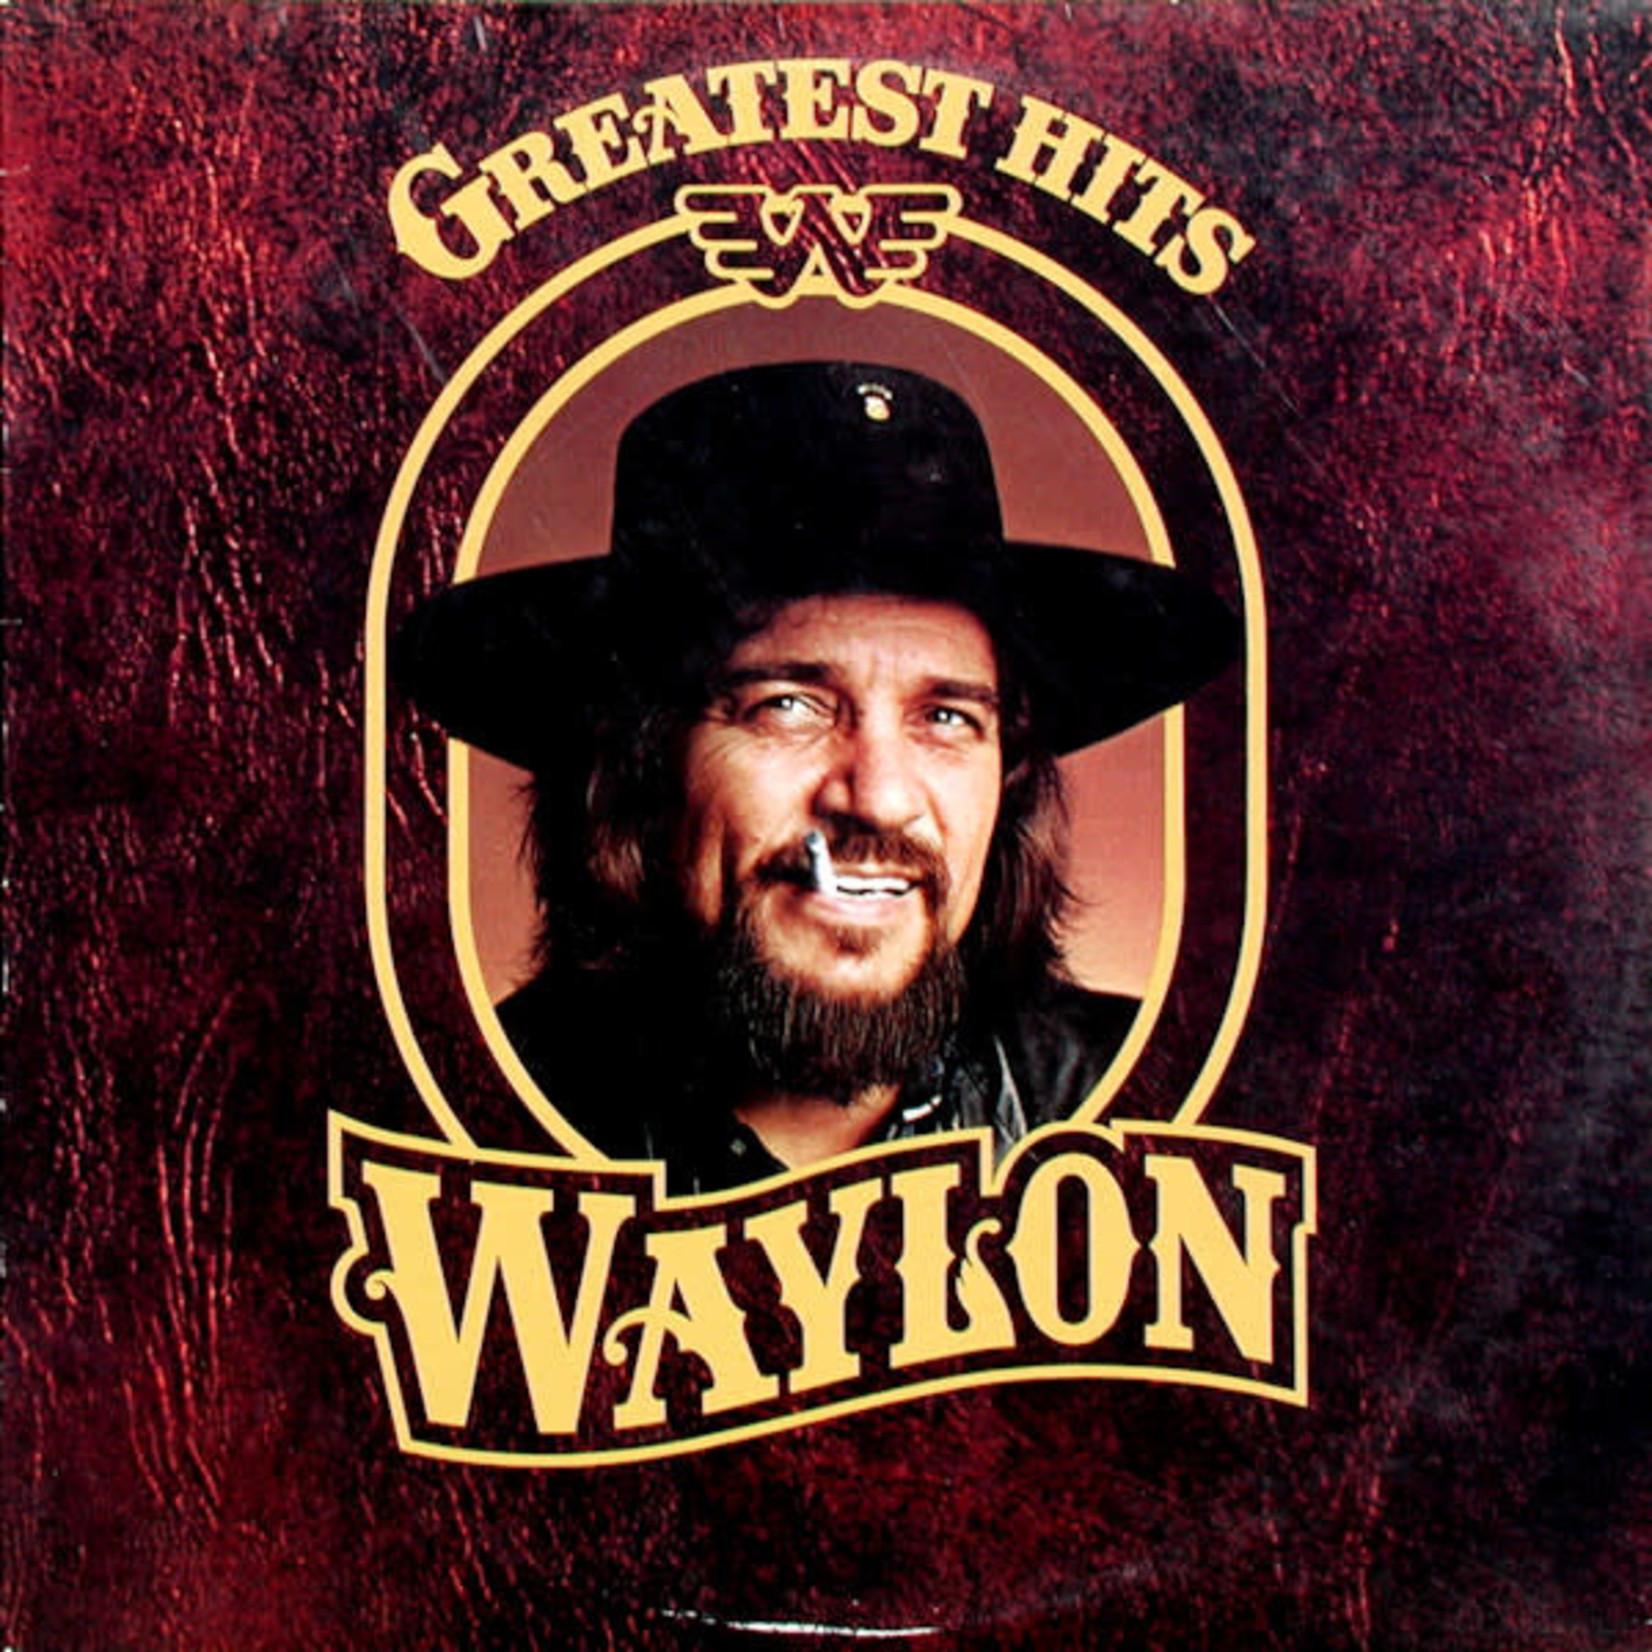 [Vintage] Jennings, Waylon: Greatest Hits